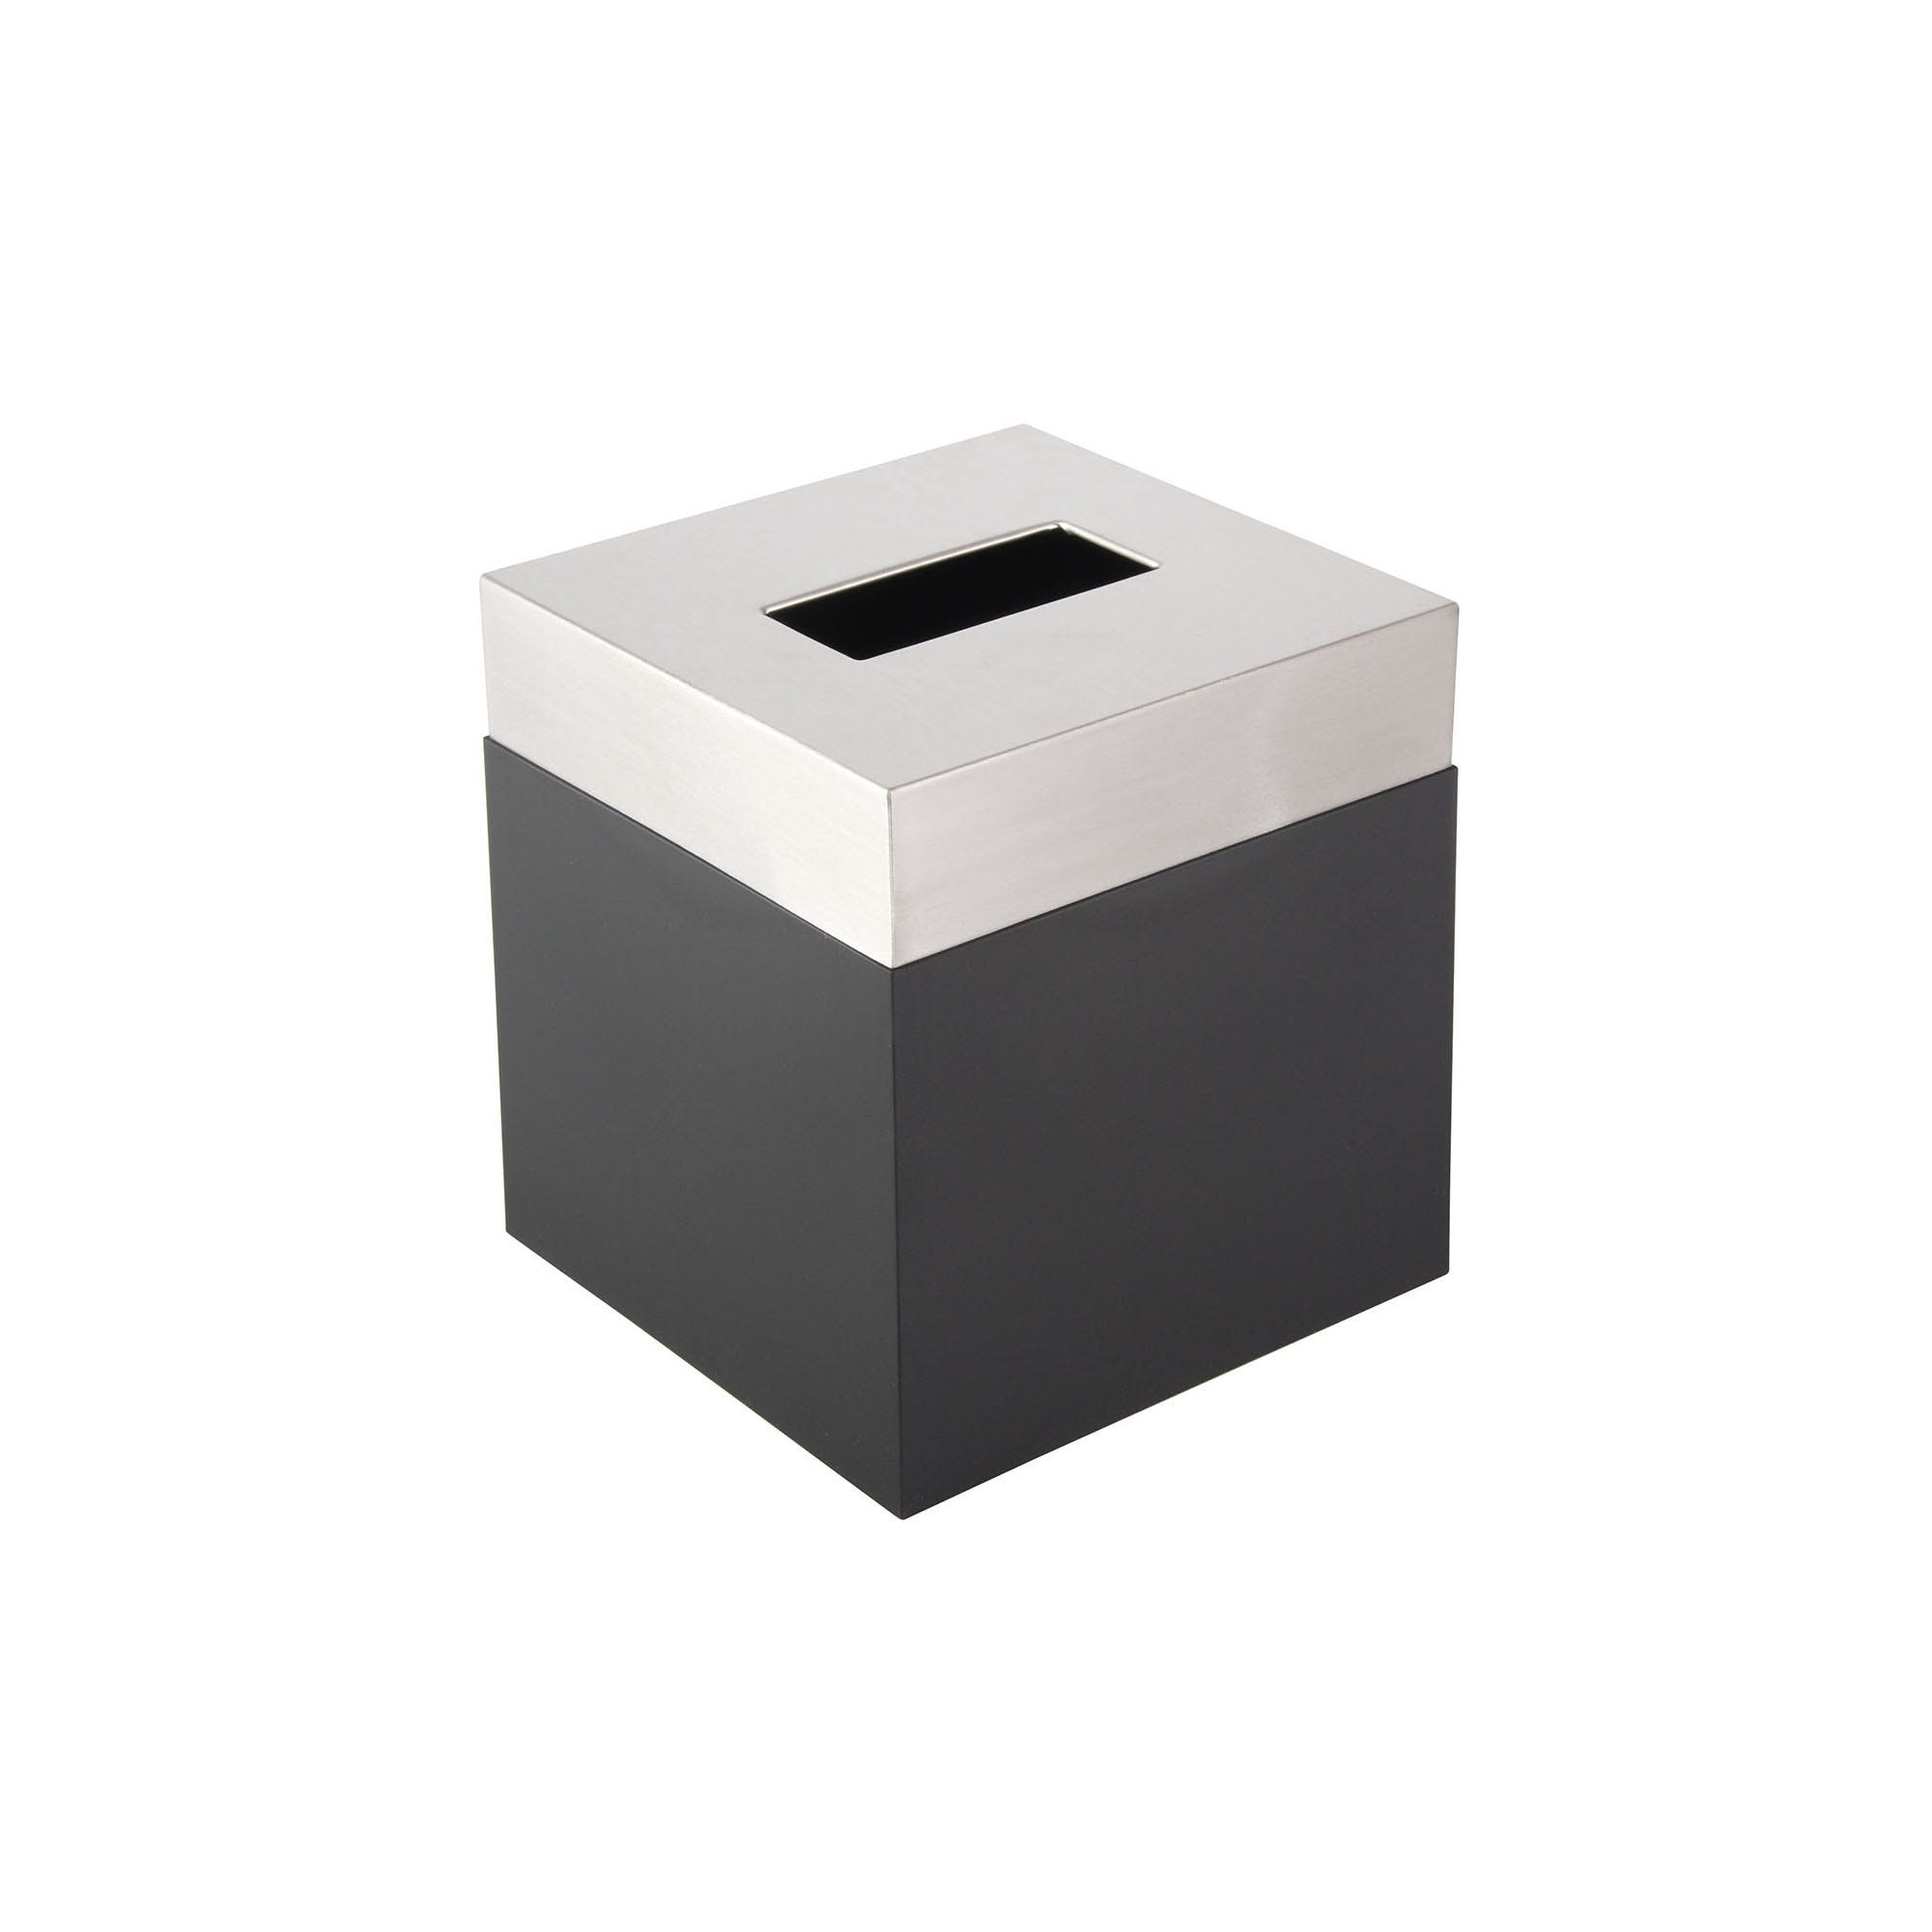 Namaro Design Dispensador de pañuelos desechables en negro